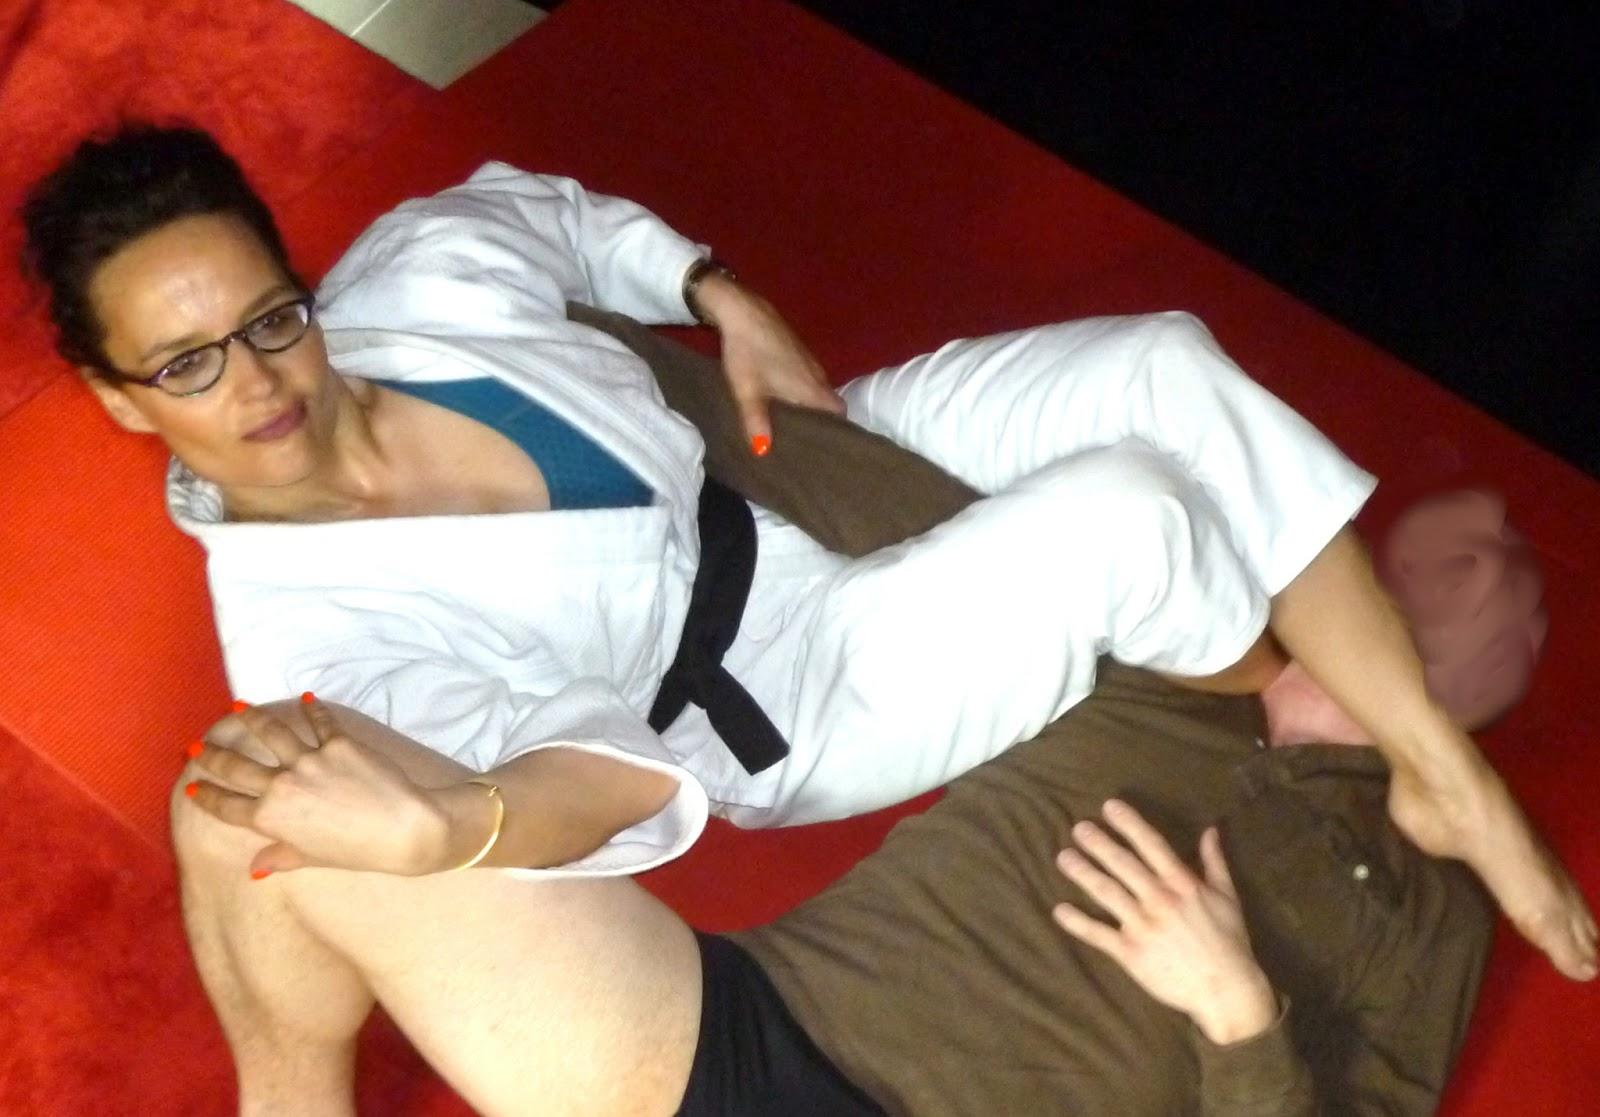 stundenhotel aachen bodensee-erotic